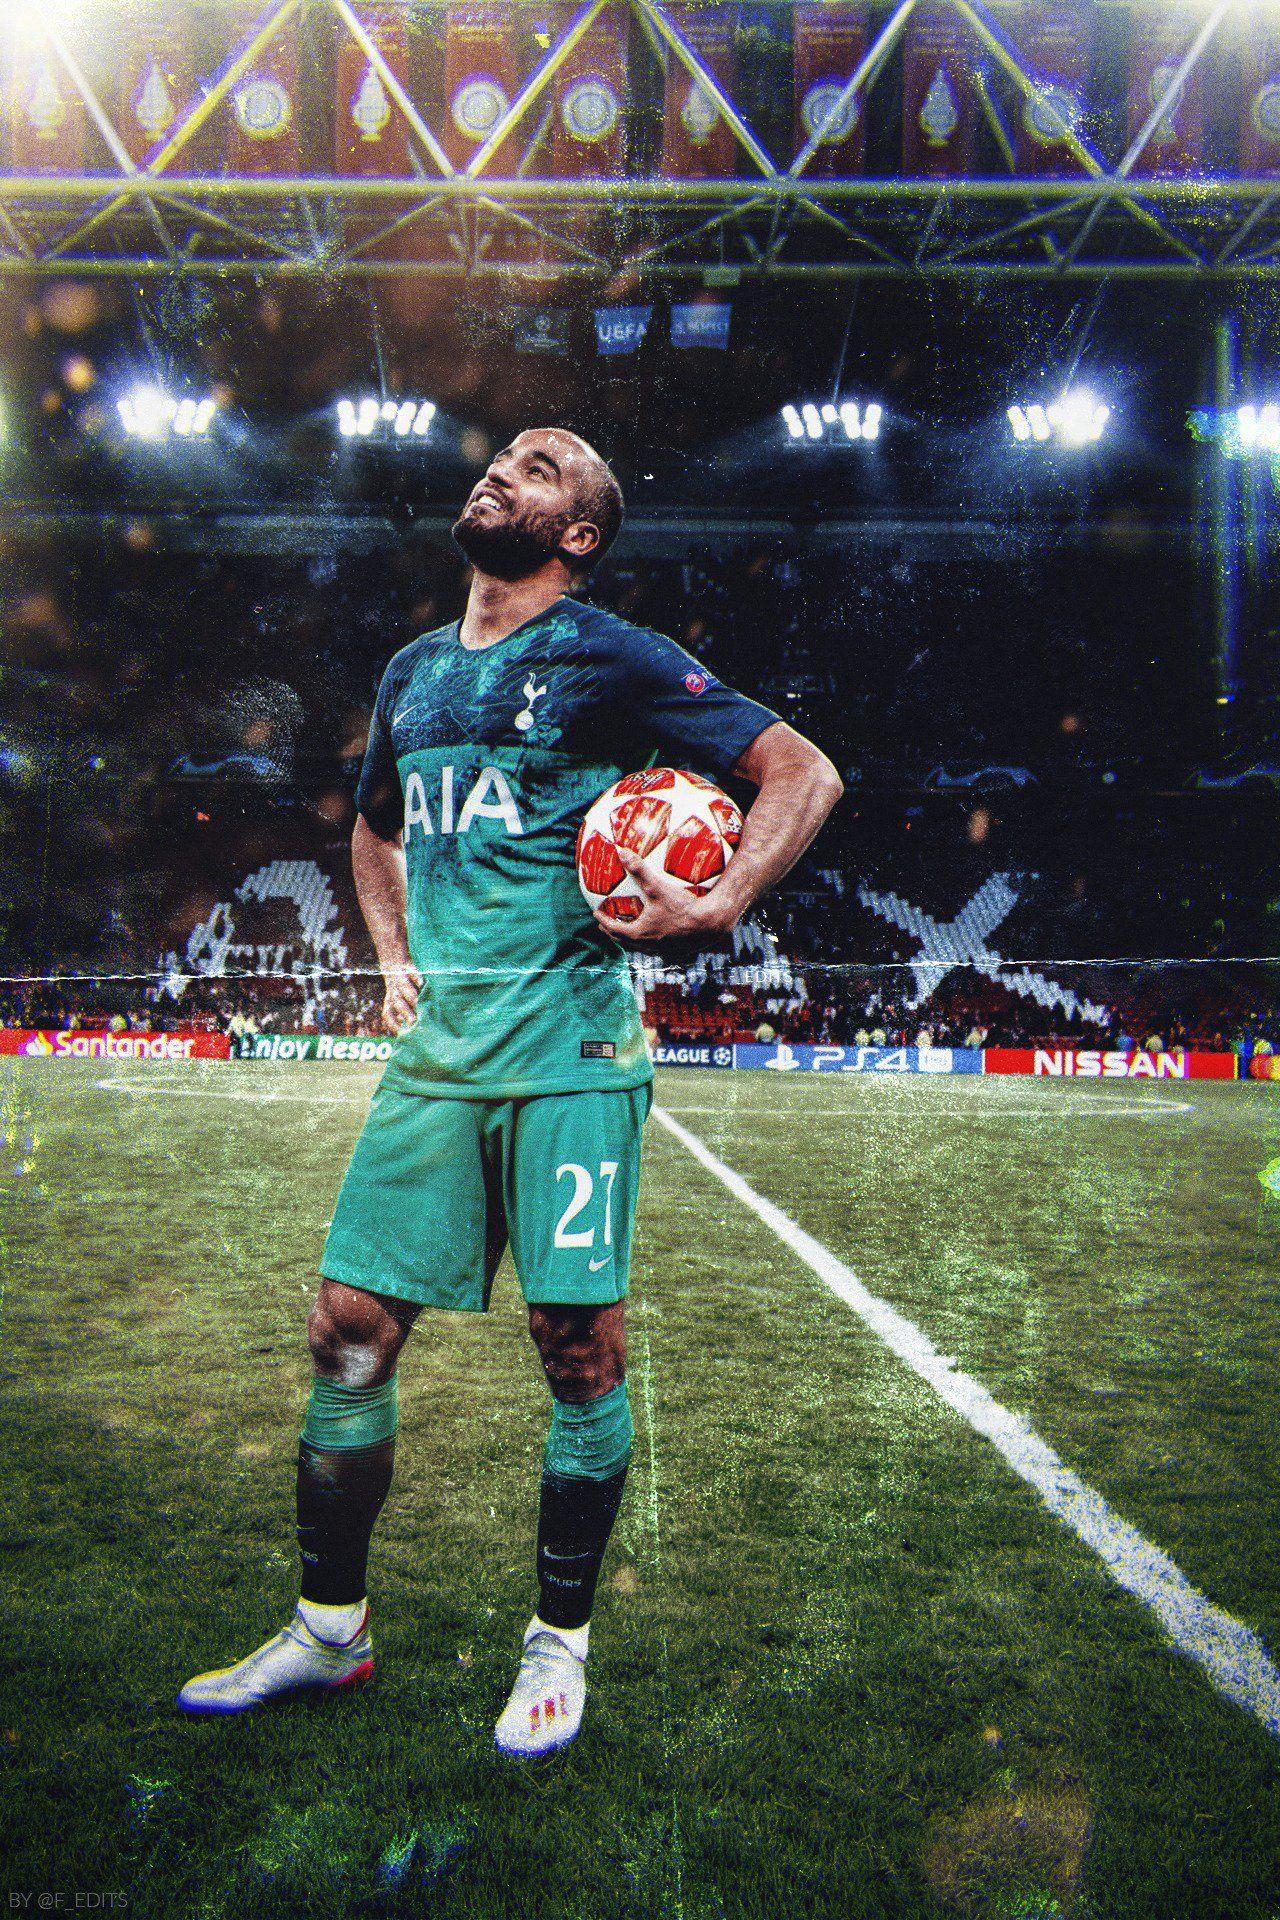 Fredrik on Spursy Tottenham hotspur football Tottenham 1280x1920